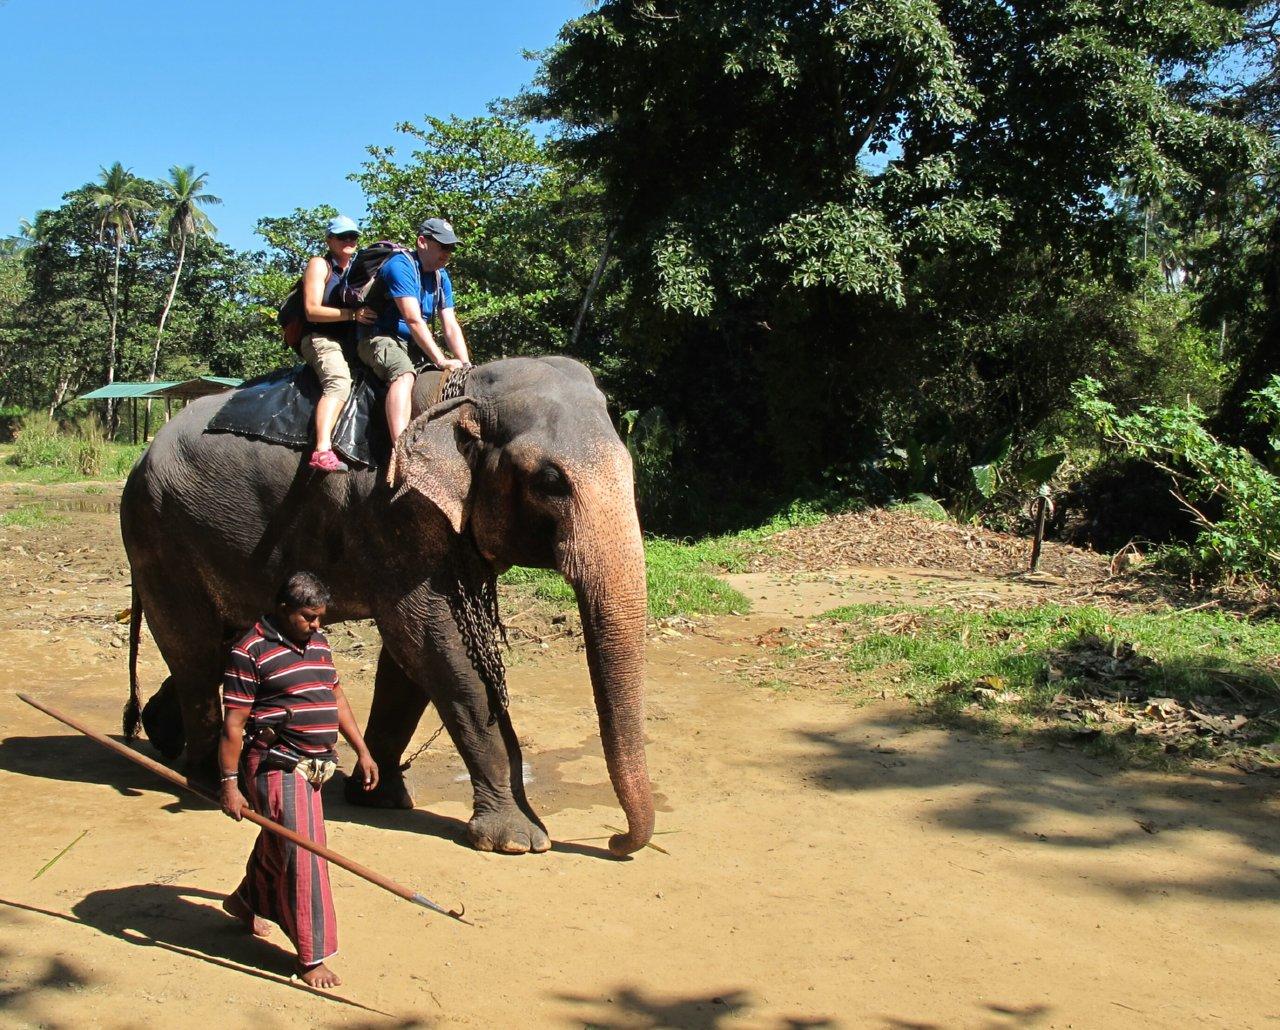 A trip to Sri Lanka